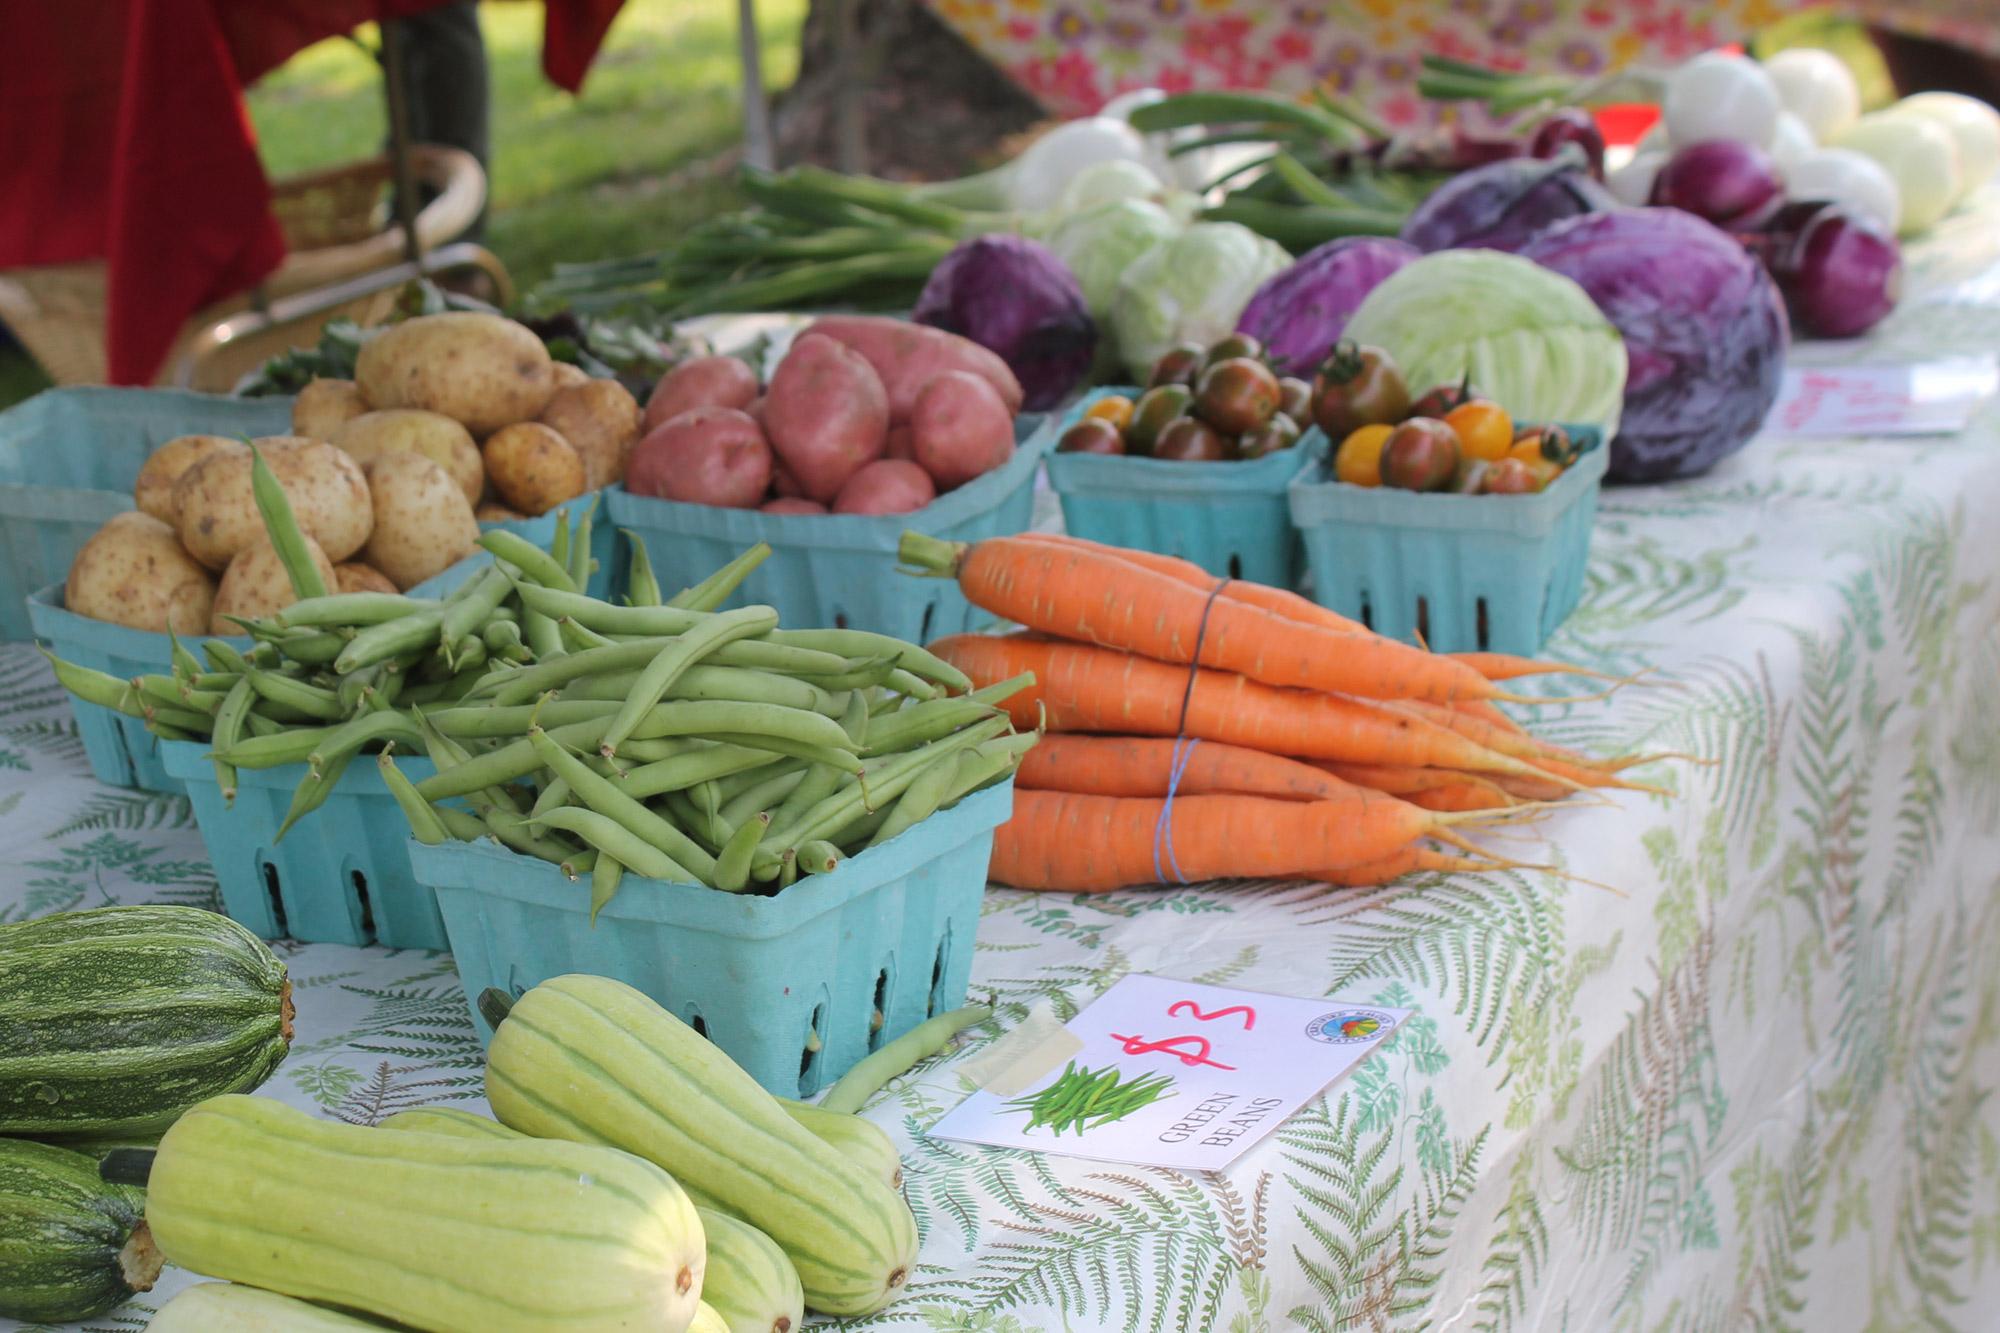 Incentive Program Stretches Snap Dollars At Farmers Markets  Iowa Public  Radio